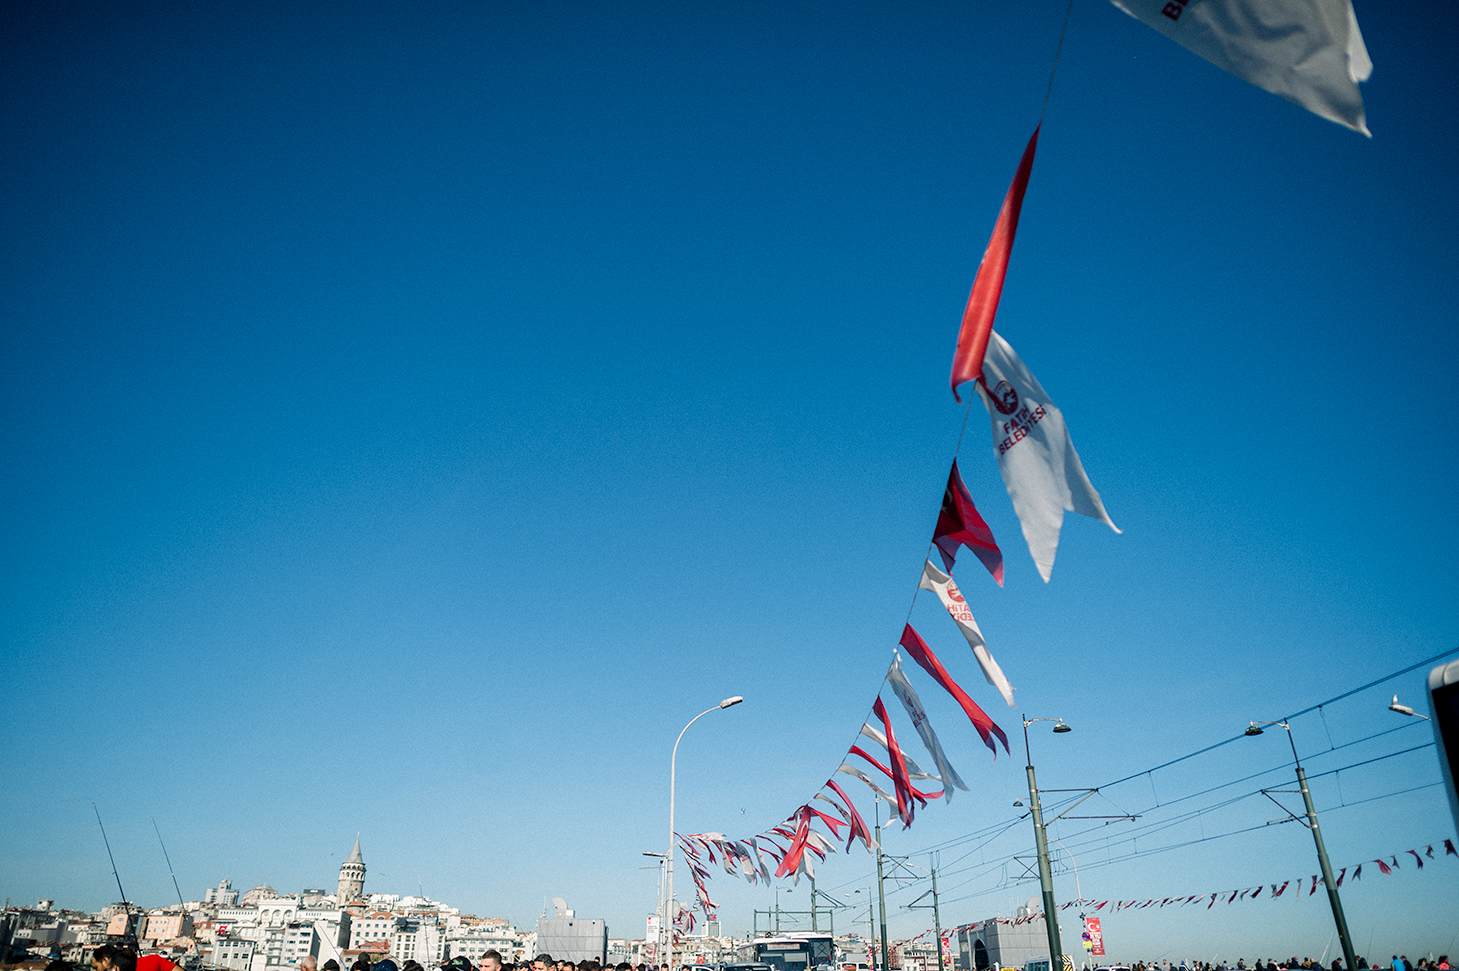 20181027_ISTANBUL_275.jpg